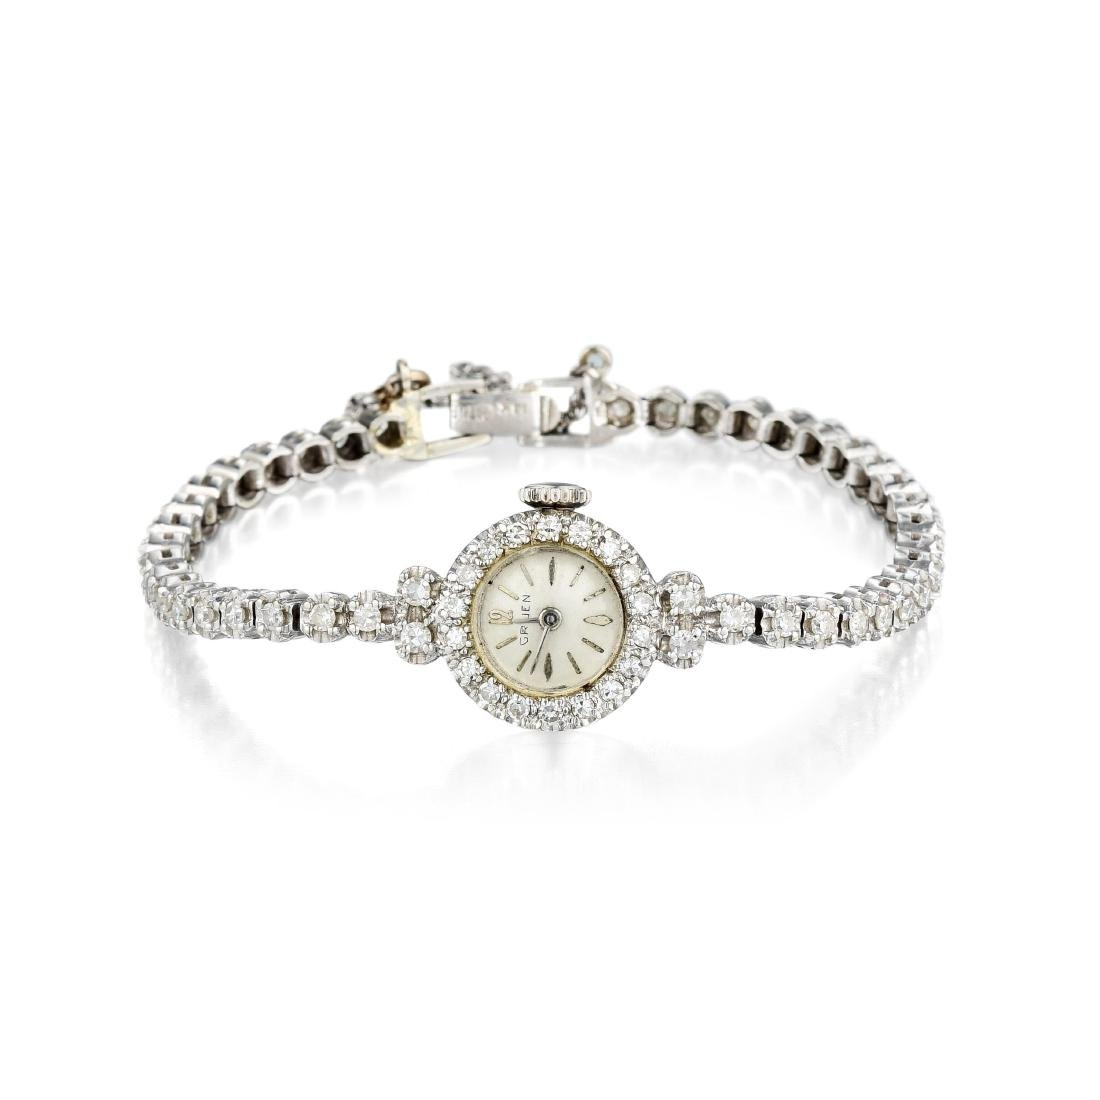 A 14K White Gold Diamond Ladies Watch